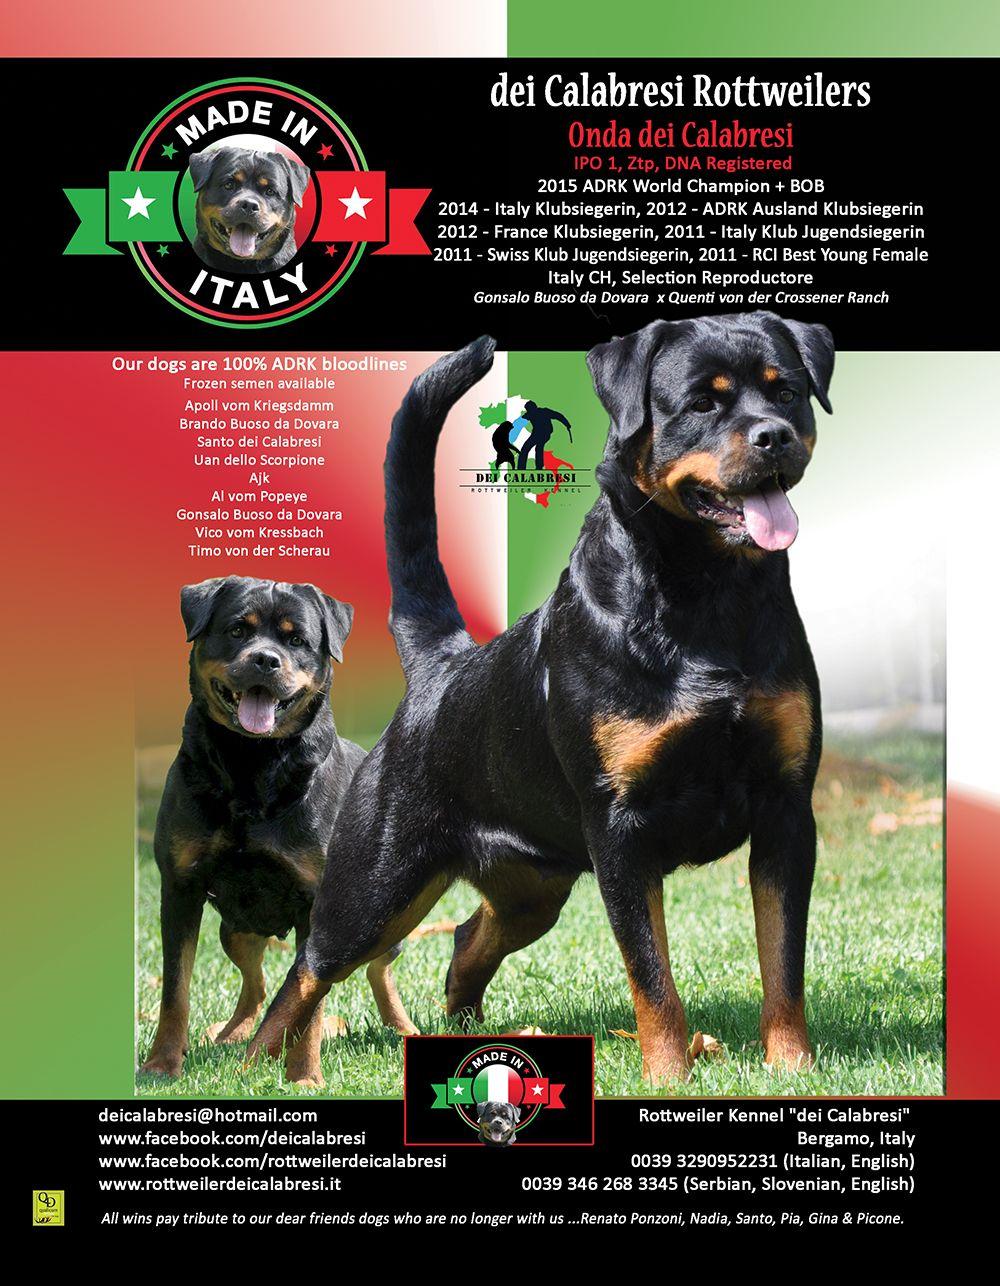 Rottweiler Kennel Dei Calabresi Bergamo Italy 0039 3290952231